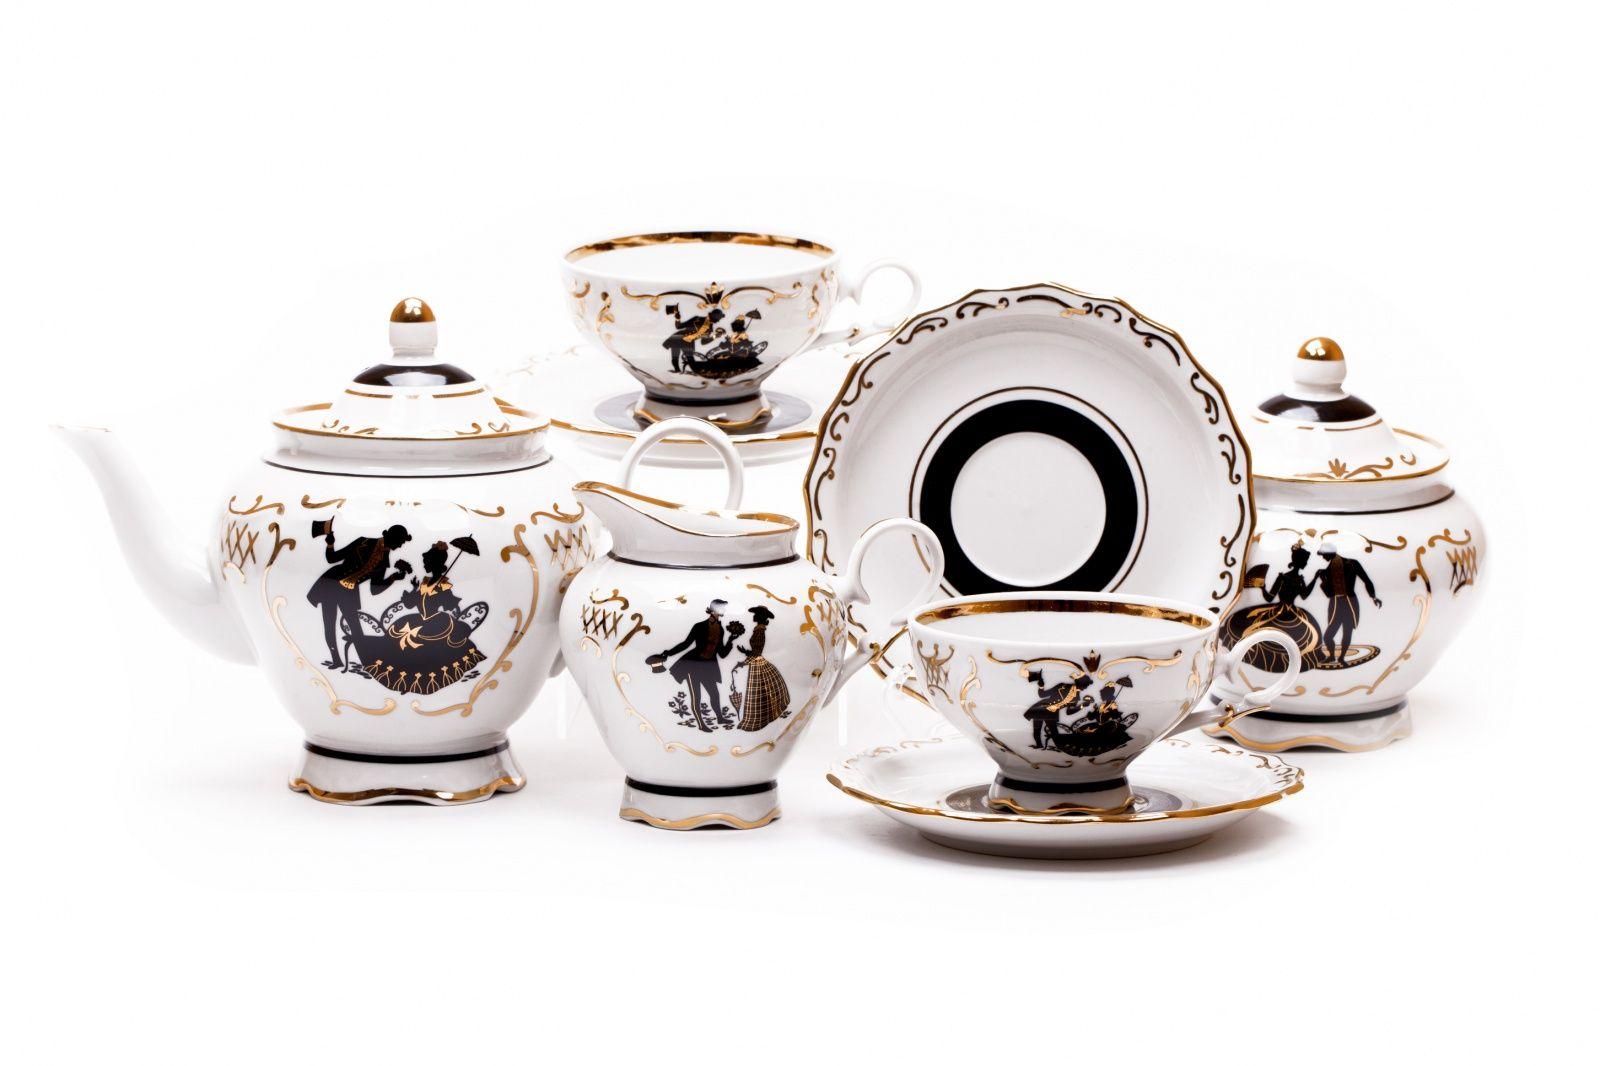 Dulevo porcelain / Tea set 15 pcs. Agate Silhouettes